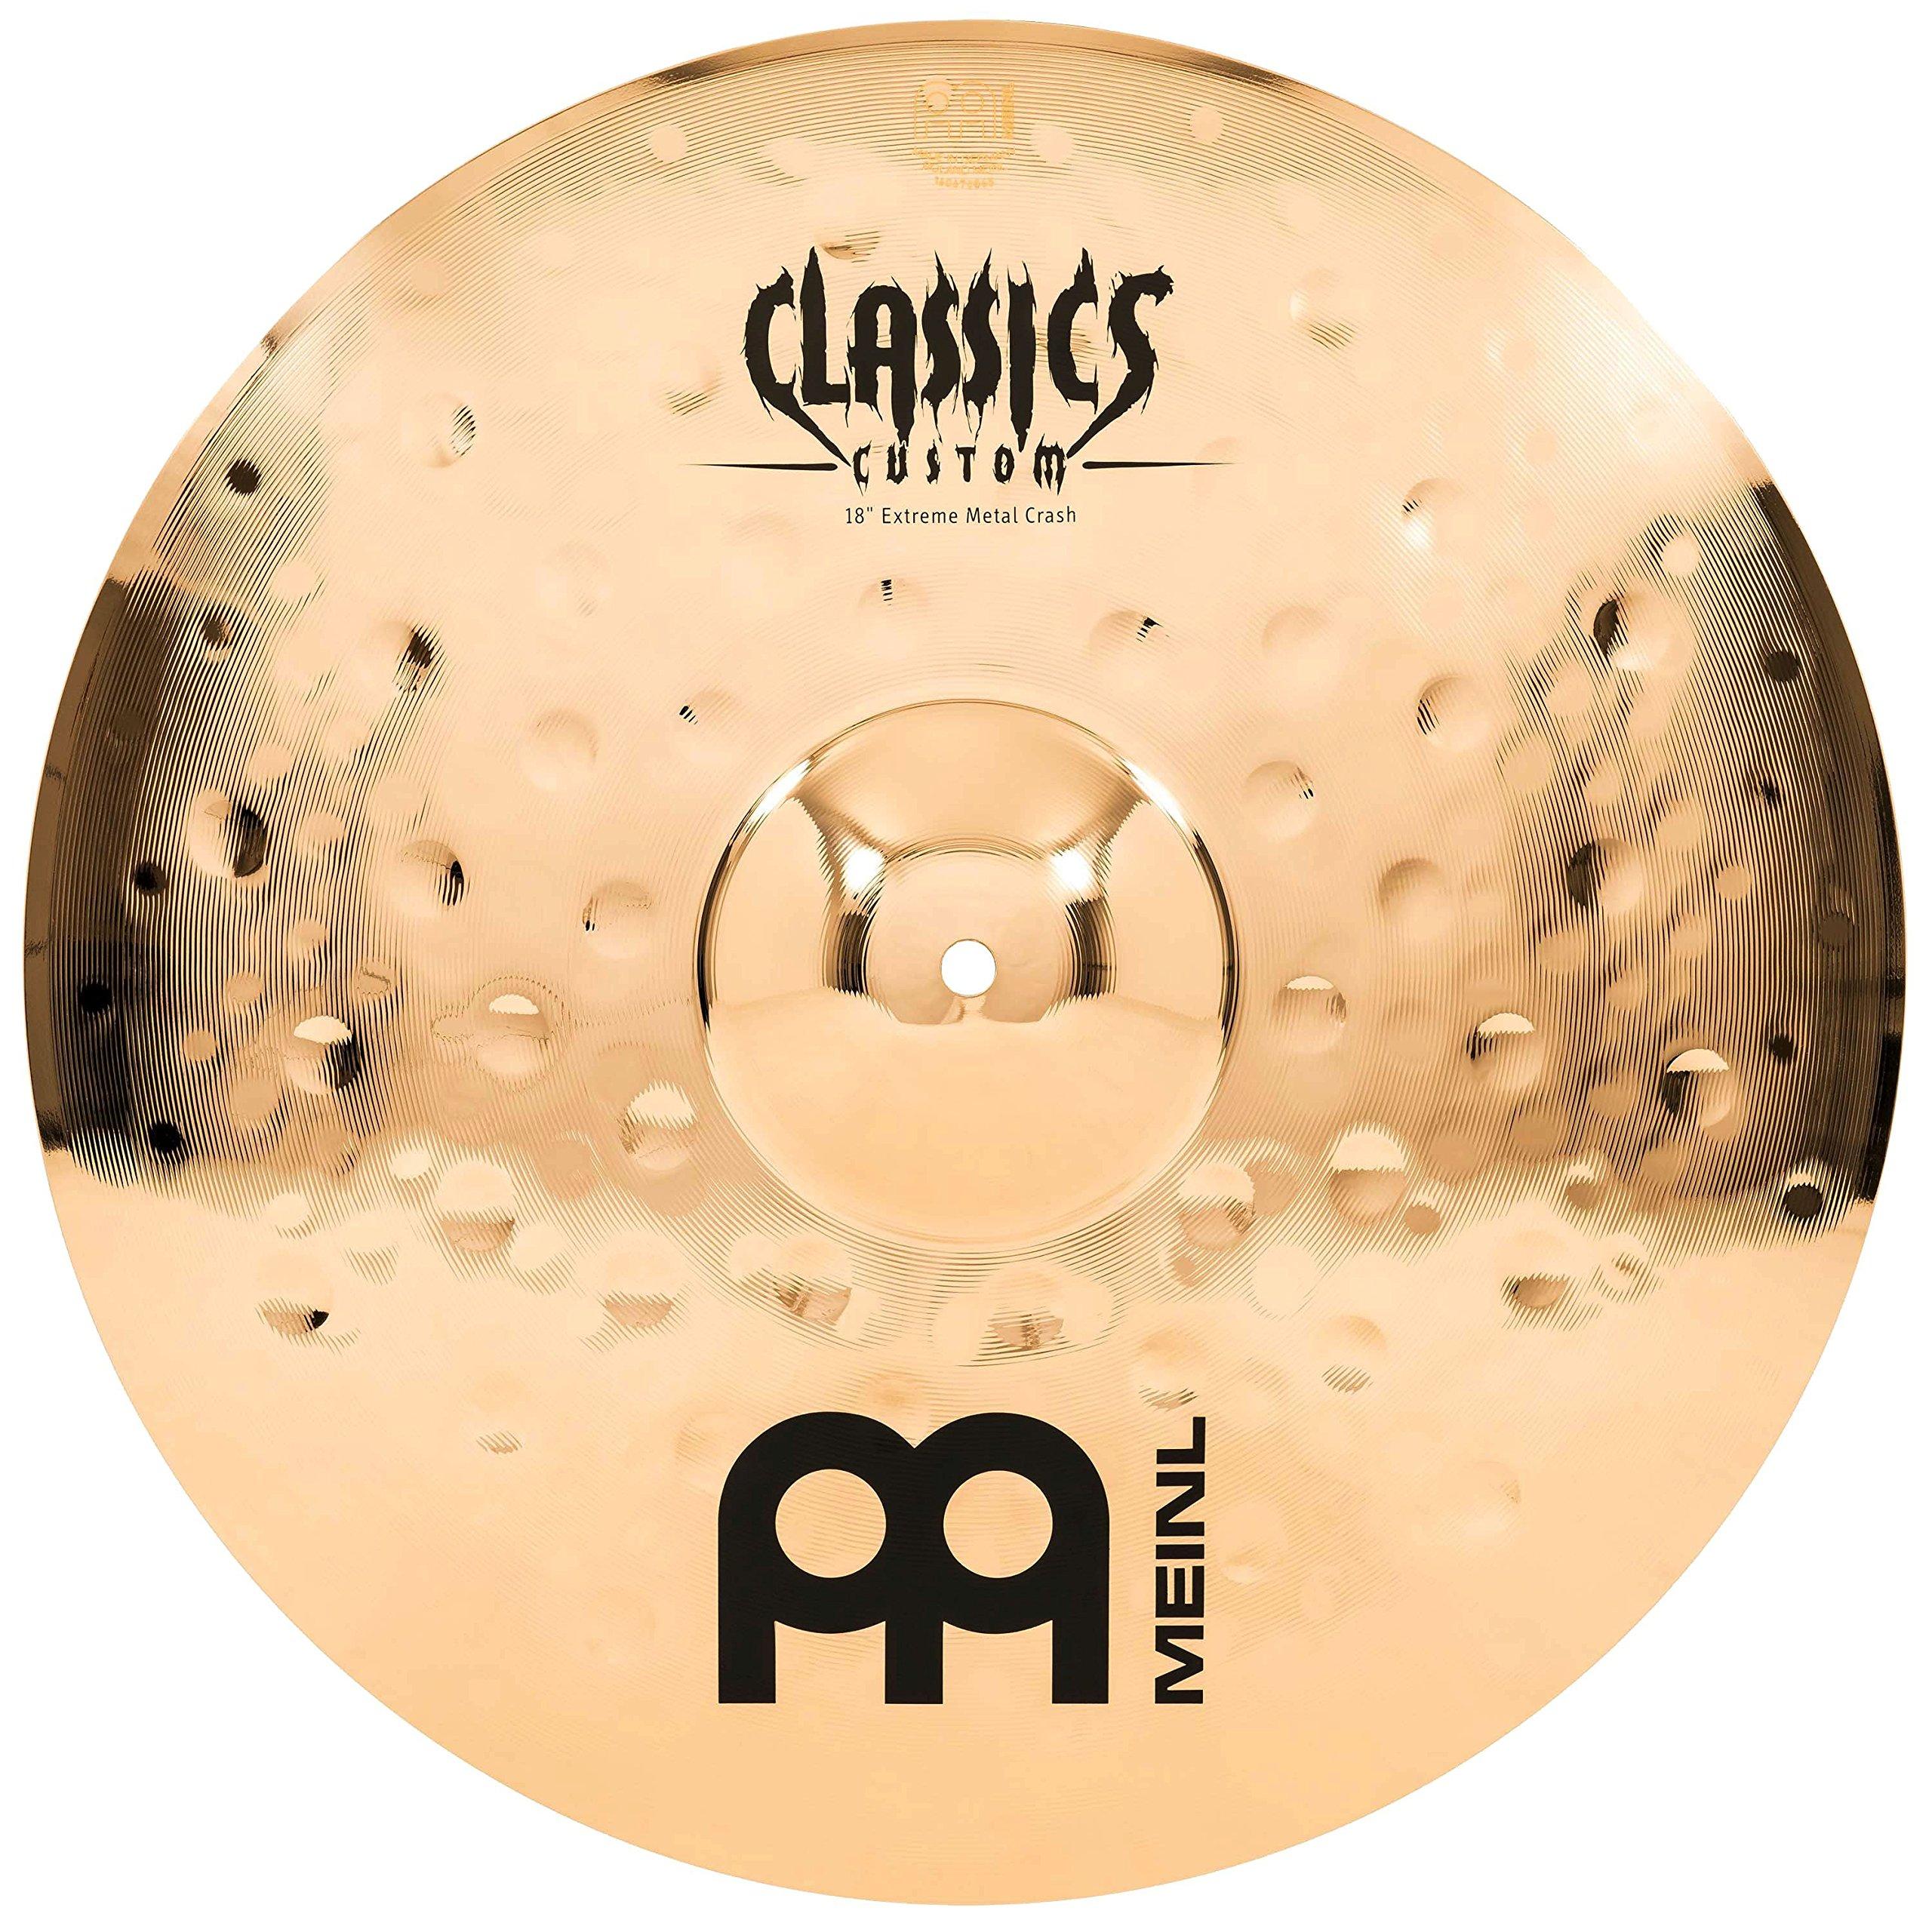 Meinl Cymbals CC18EMC-B Classics Custom Extreme Metal 18-Inch Brilliant Finish Crash Cymbal (VIDEO)